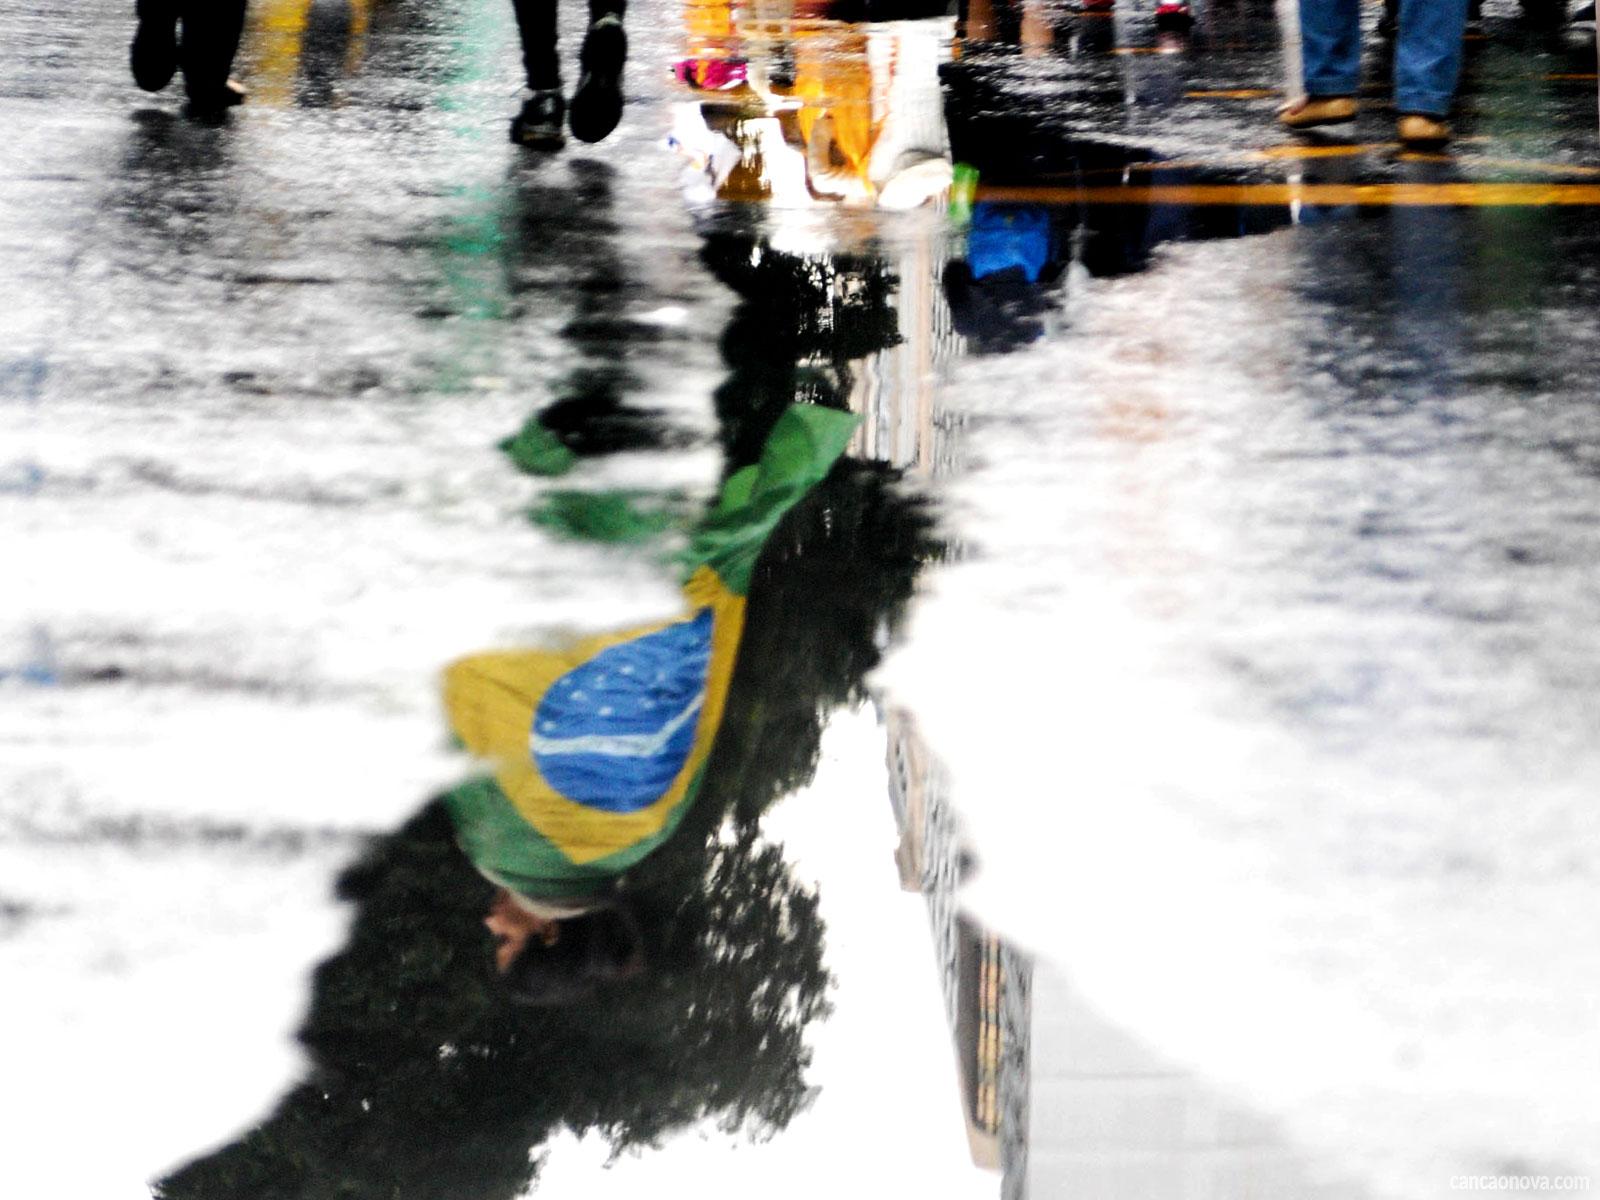 A-nossa-sociedade-brasileira-precisa-exercer-a-cidadania